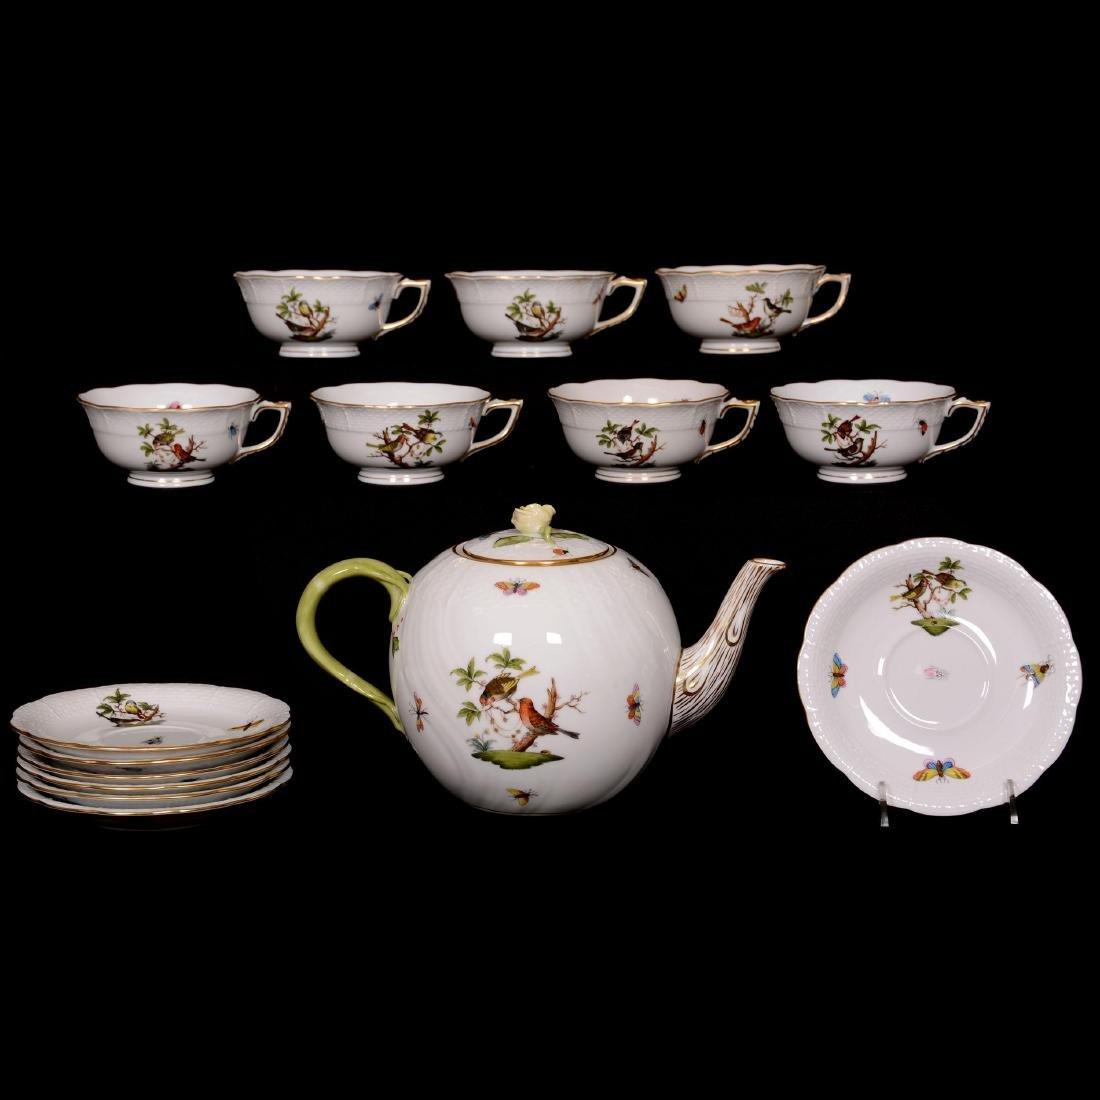 Herend Hungary Porcelain Hand Painted Fifteen Piece Tea